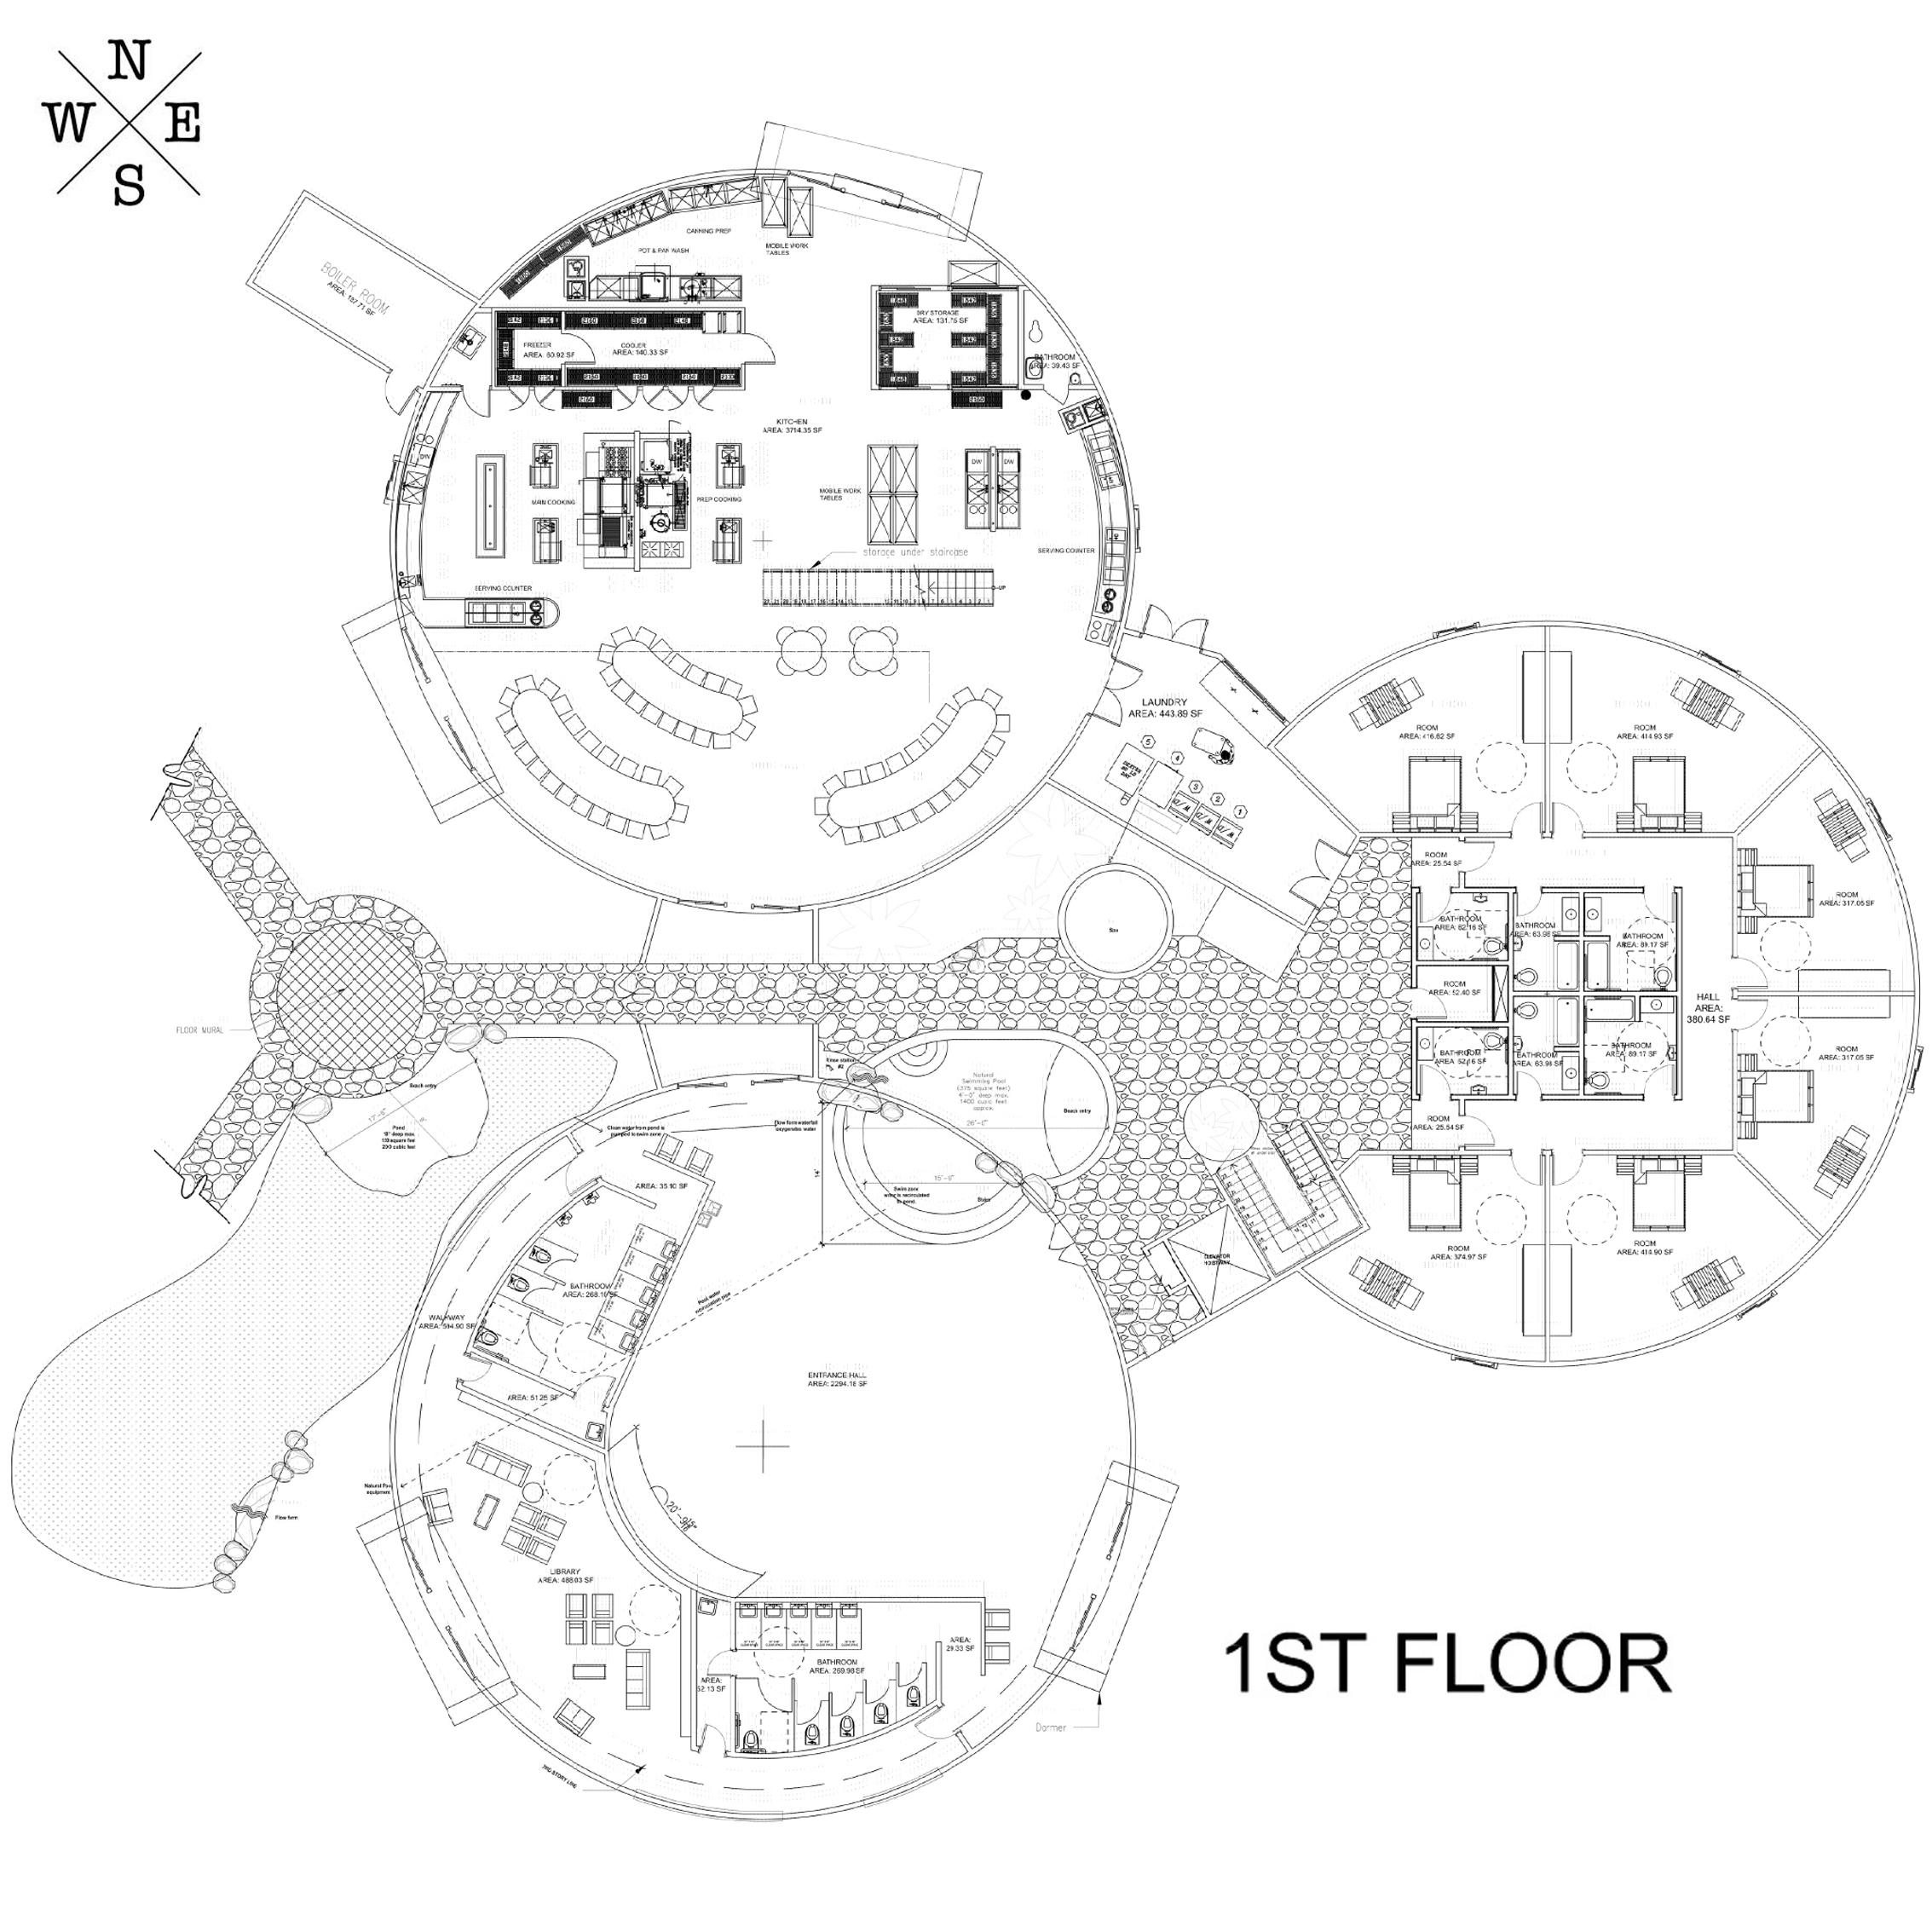 Duplicable City Center Open Source Leed Platinum Eco